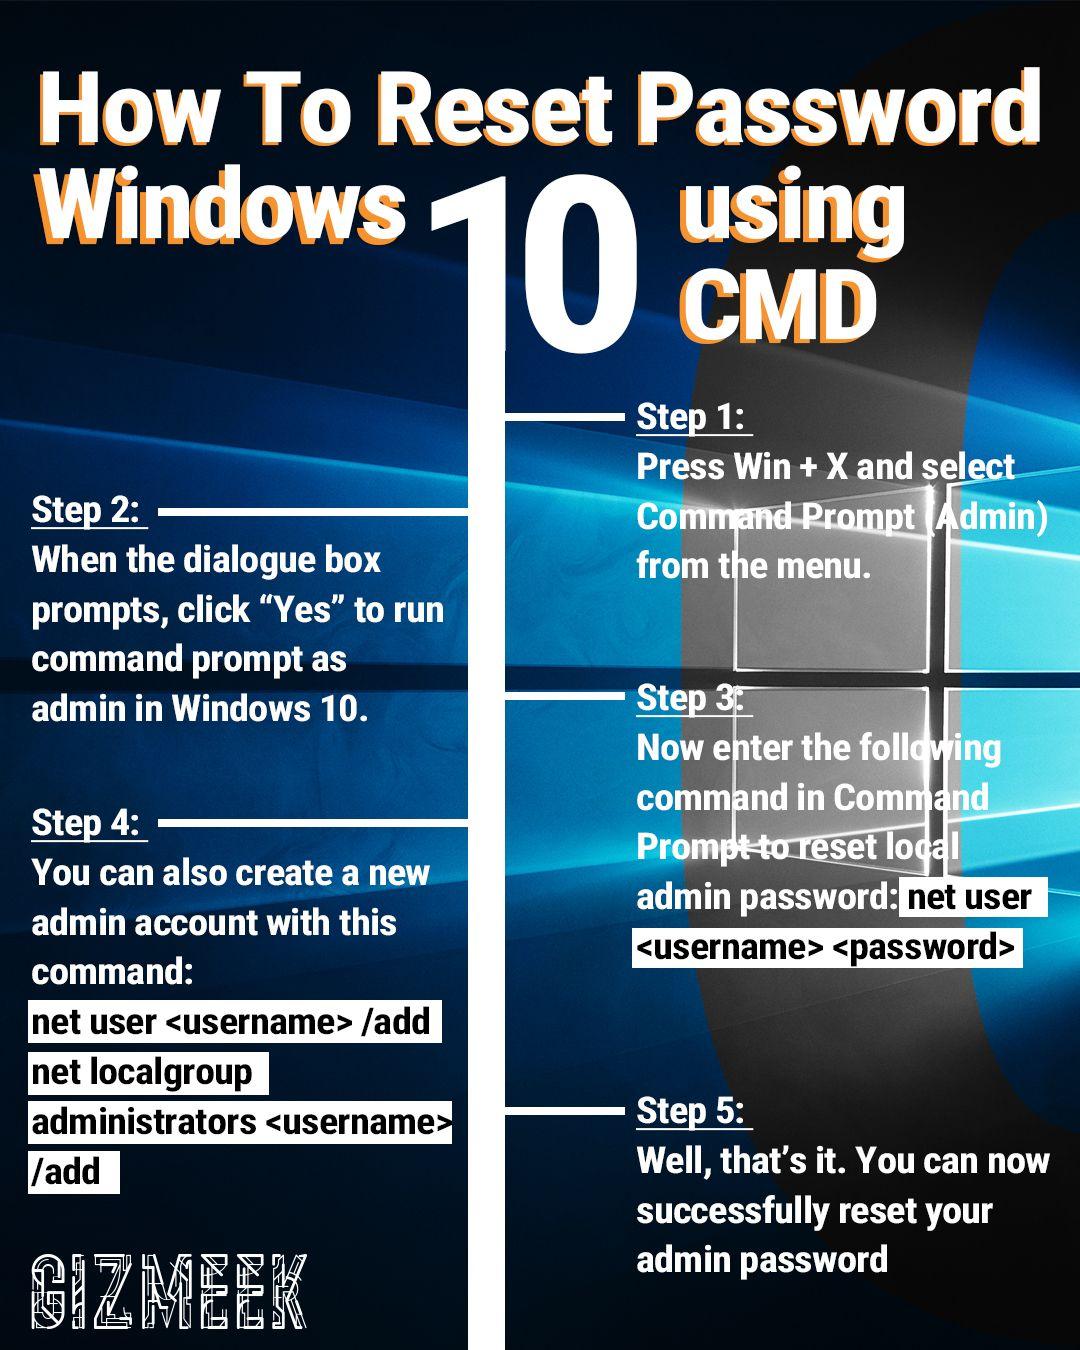 How to reset windows 28 admin password using cmd – Artofit